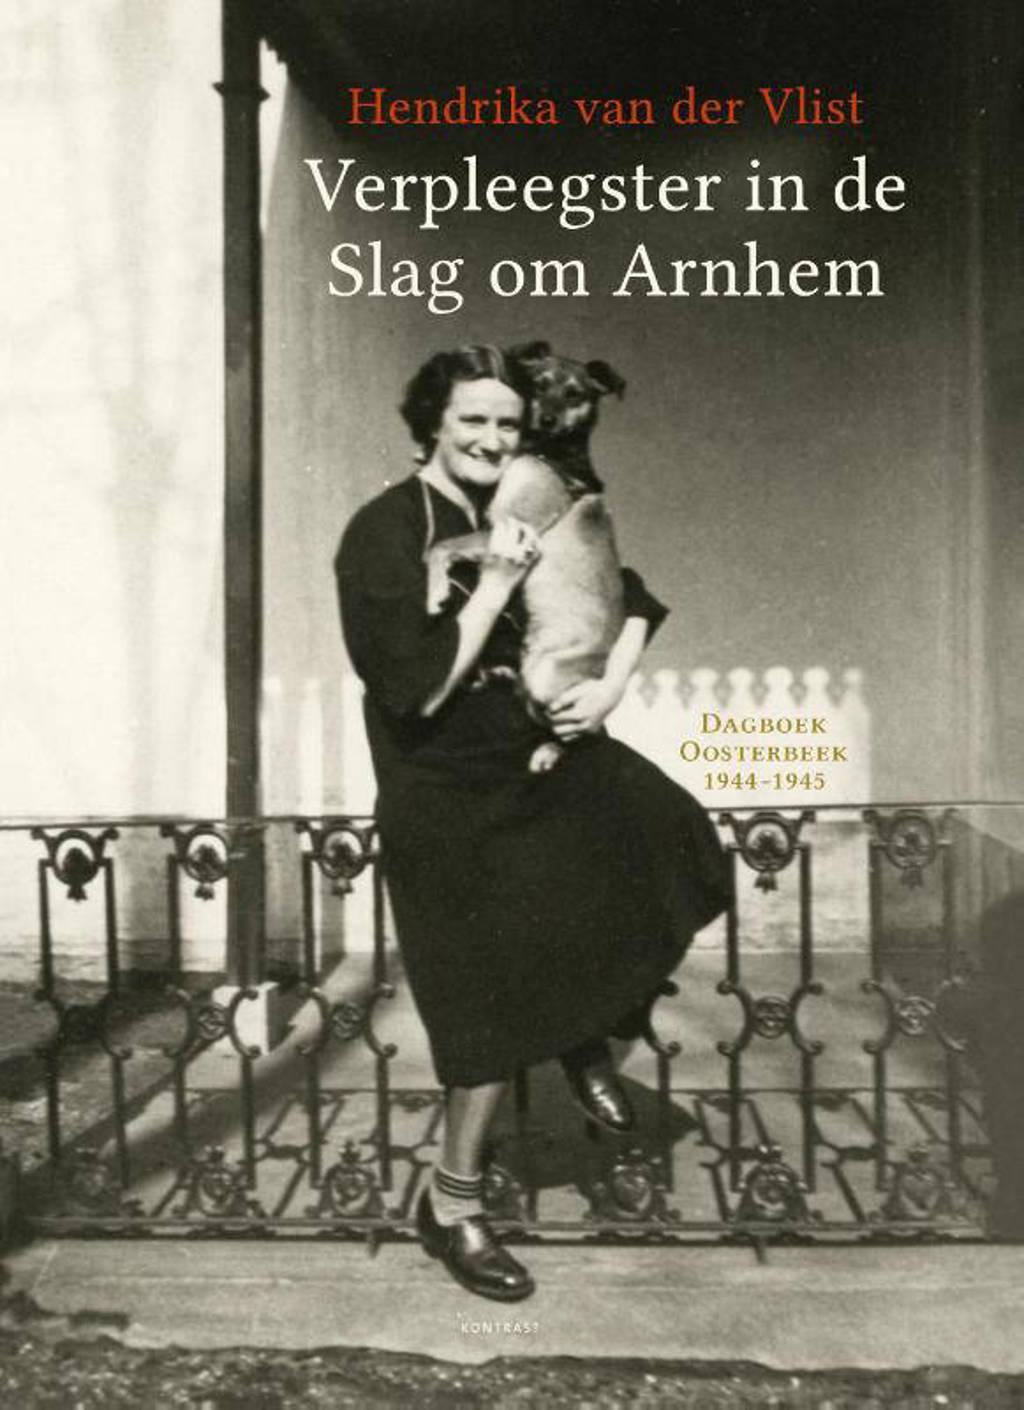 Verpleegster in de Slag om Arnhem - Hendrika van der Vlist